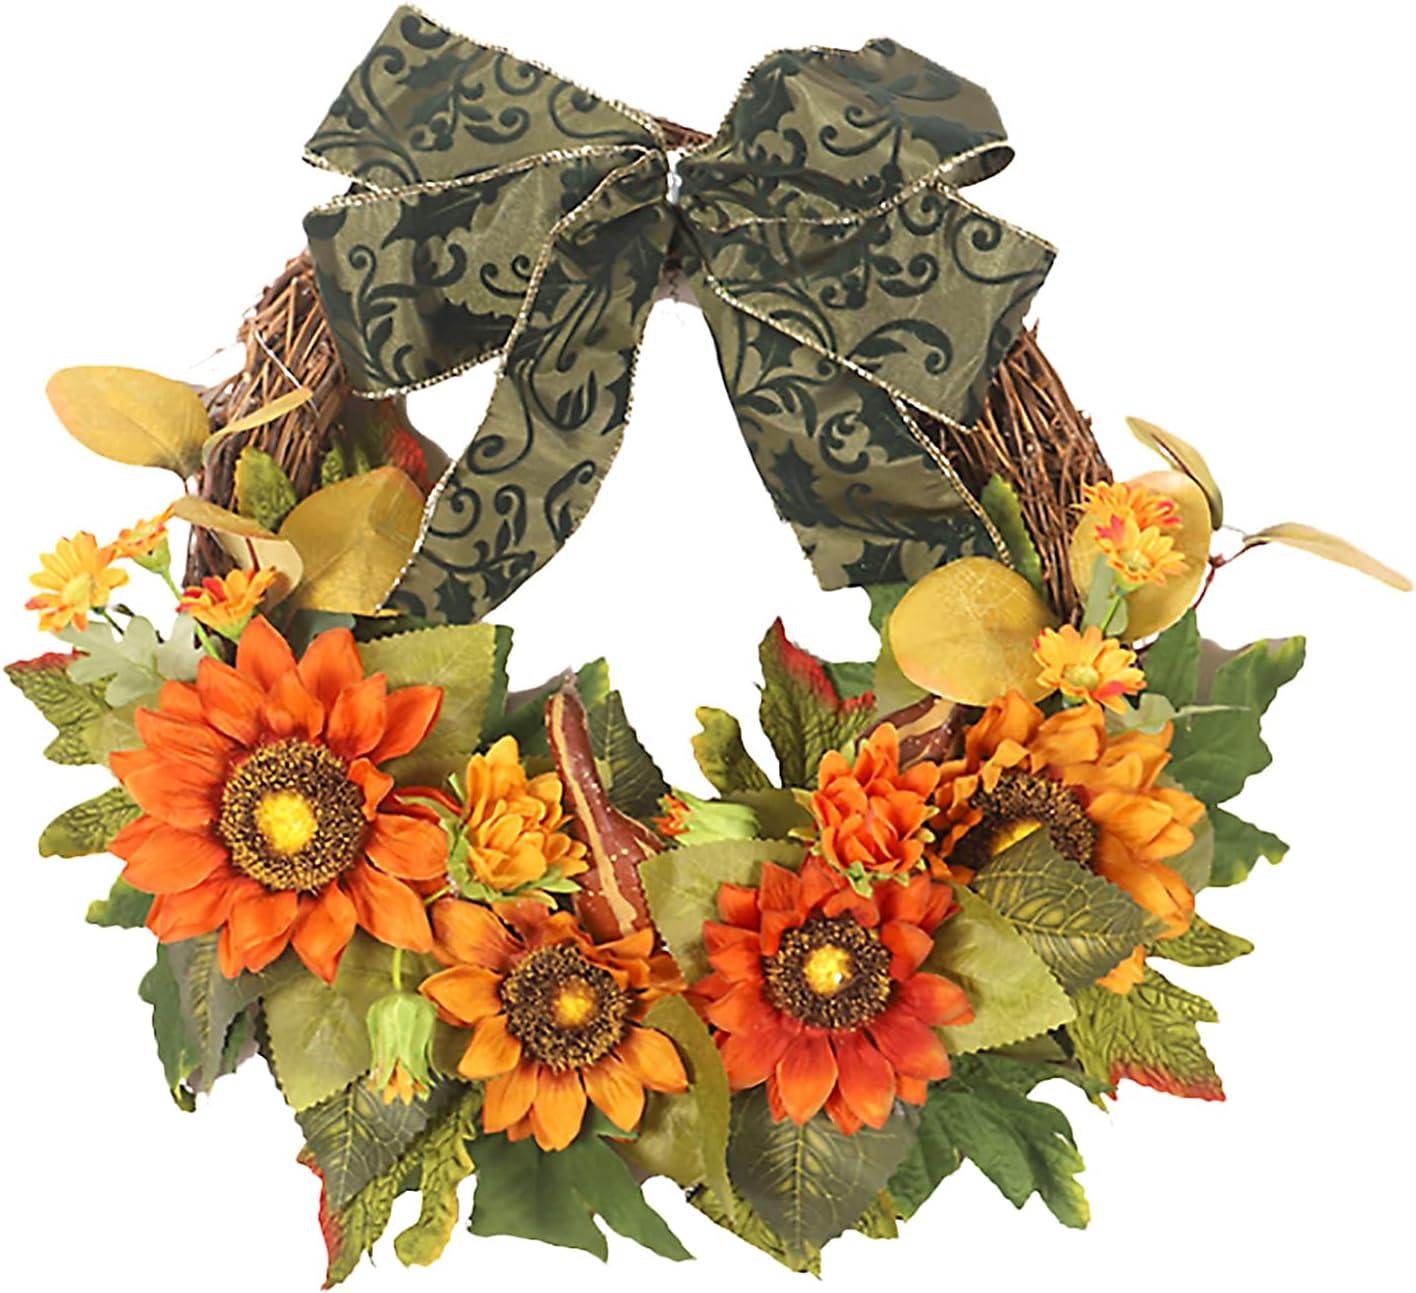 BOICXM Artificial Sunflower Max 55% OFF Max 45% OFF Wreaths,15.7Inch Rattan